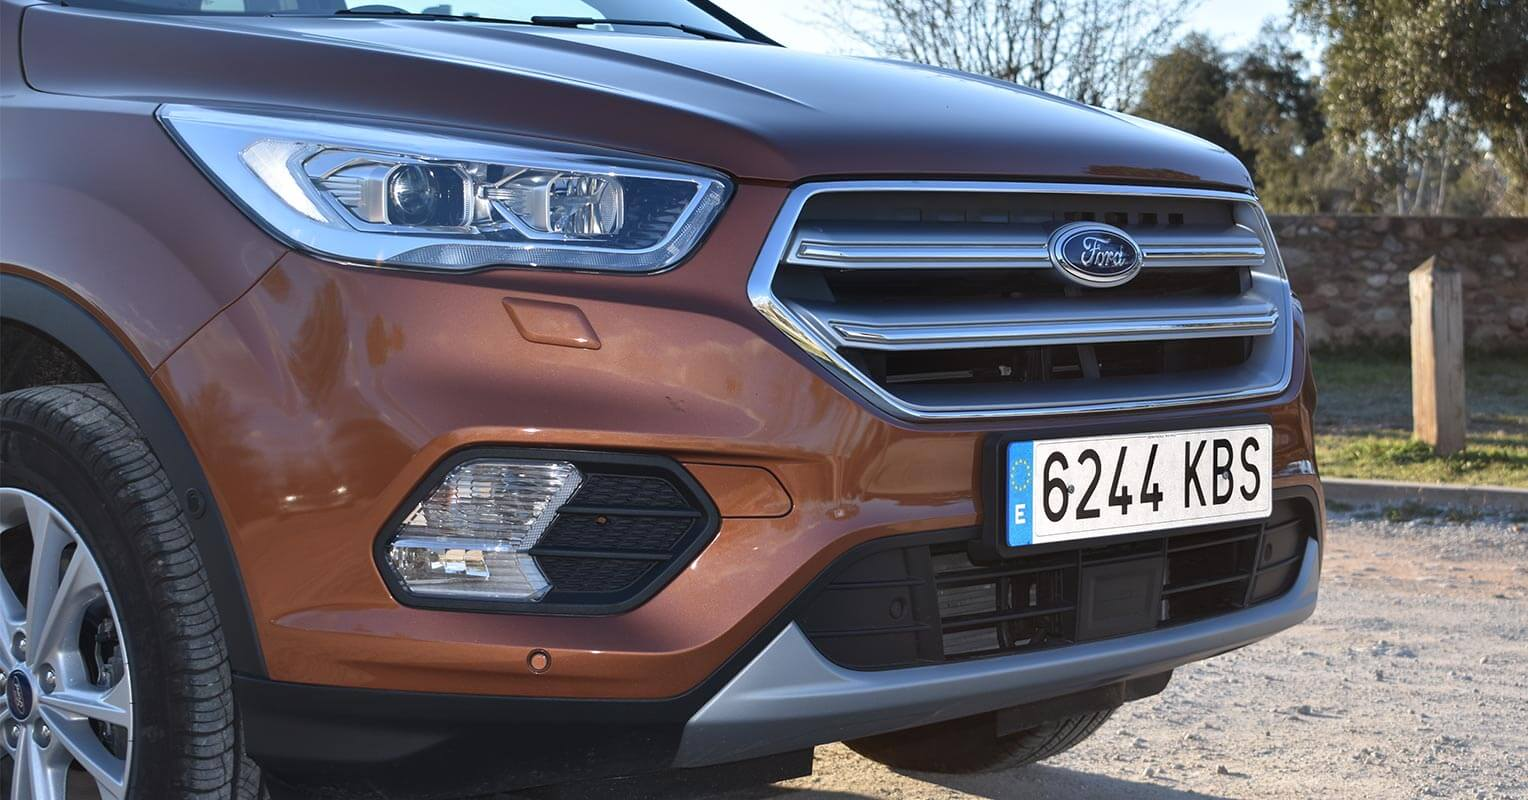 Parrilla frontal del Ford Kuga 2018